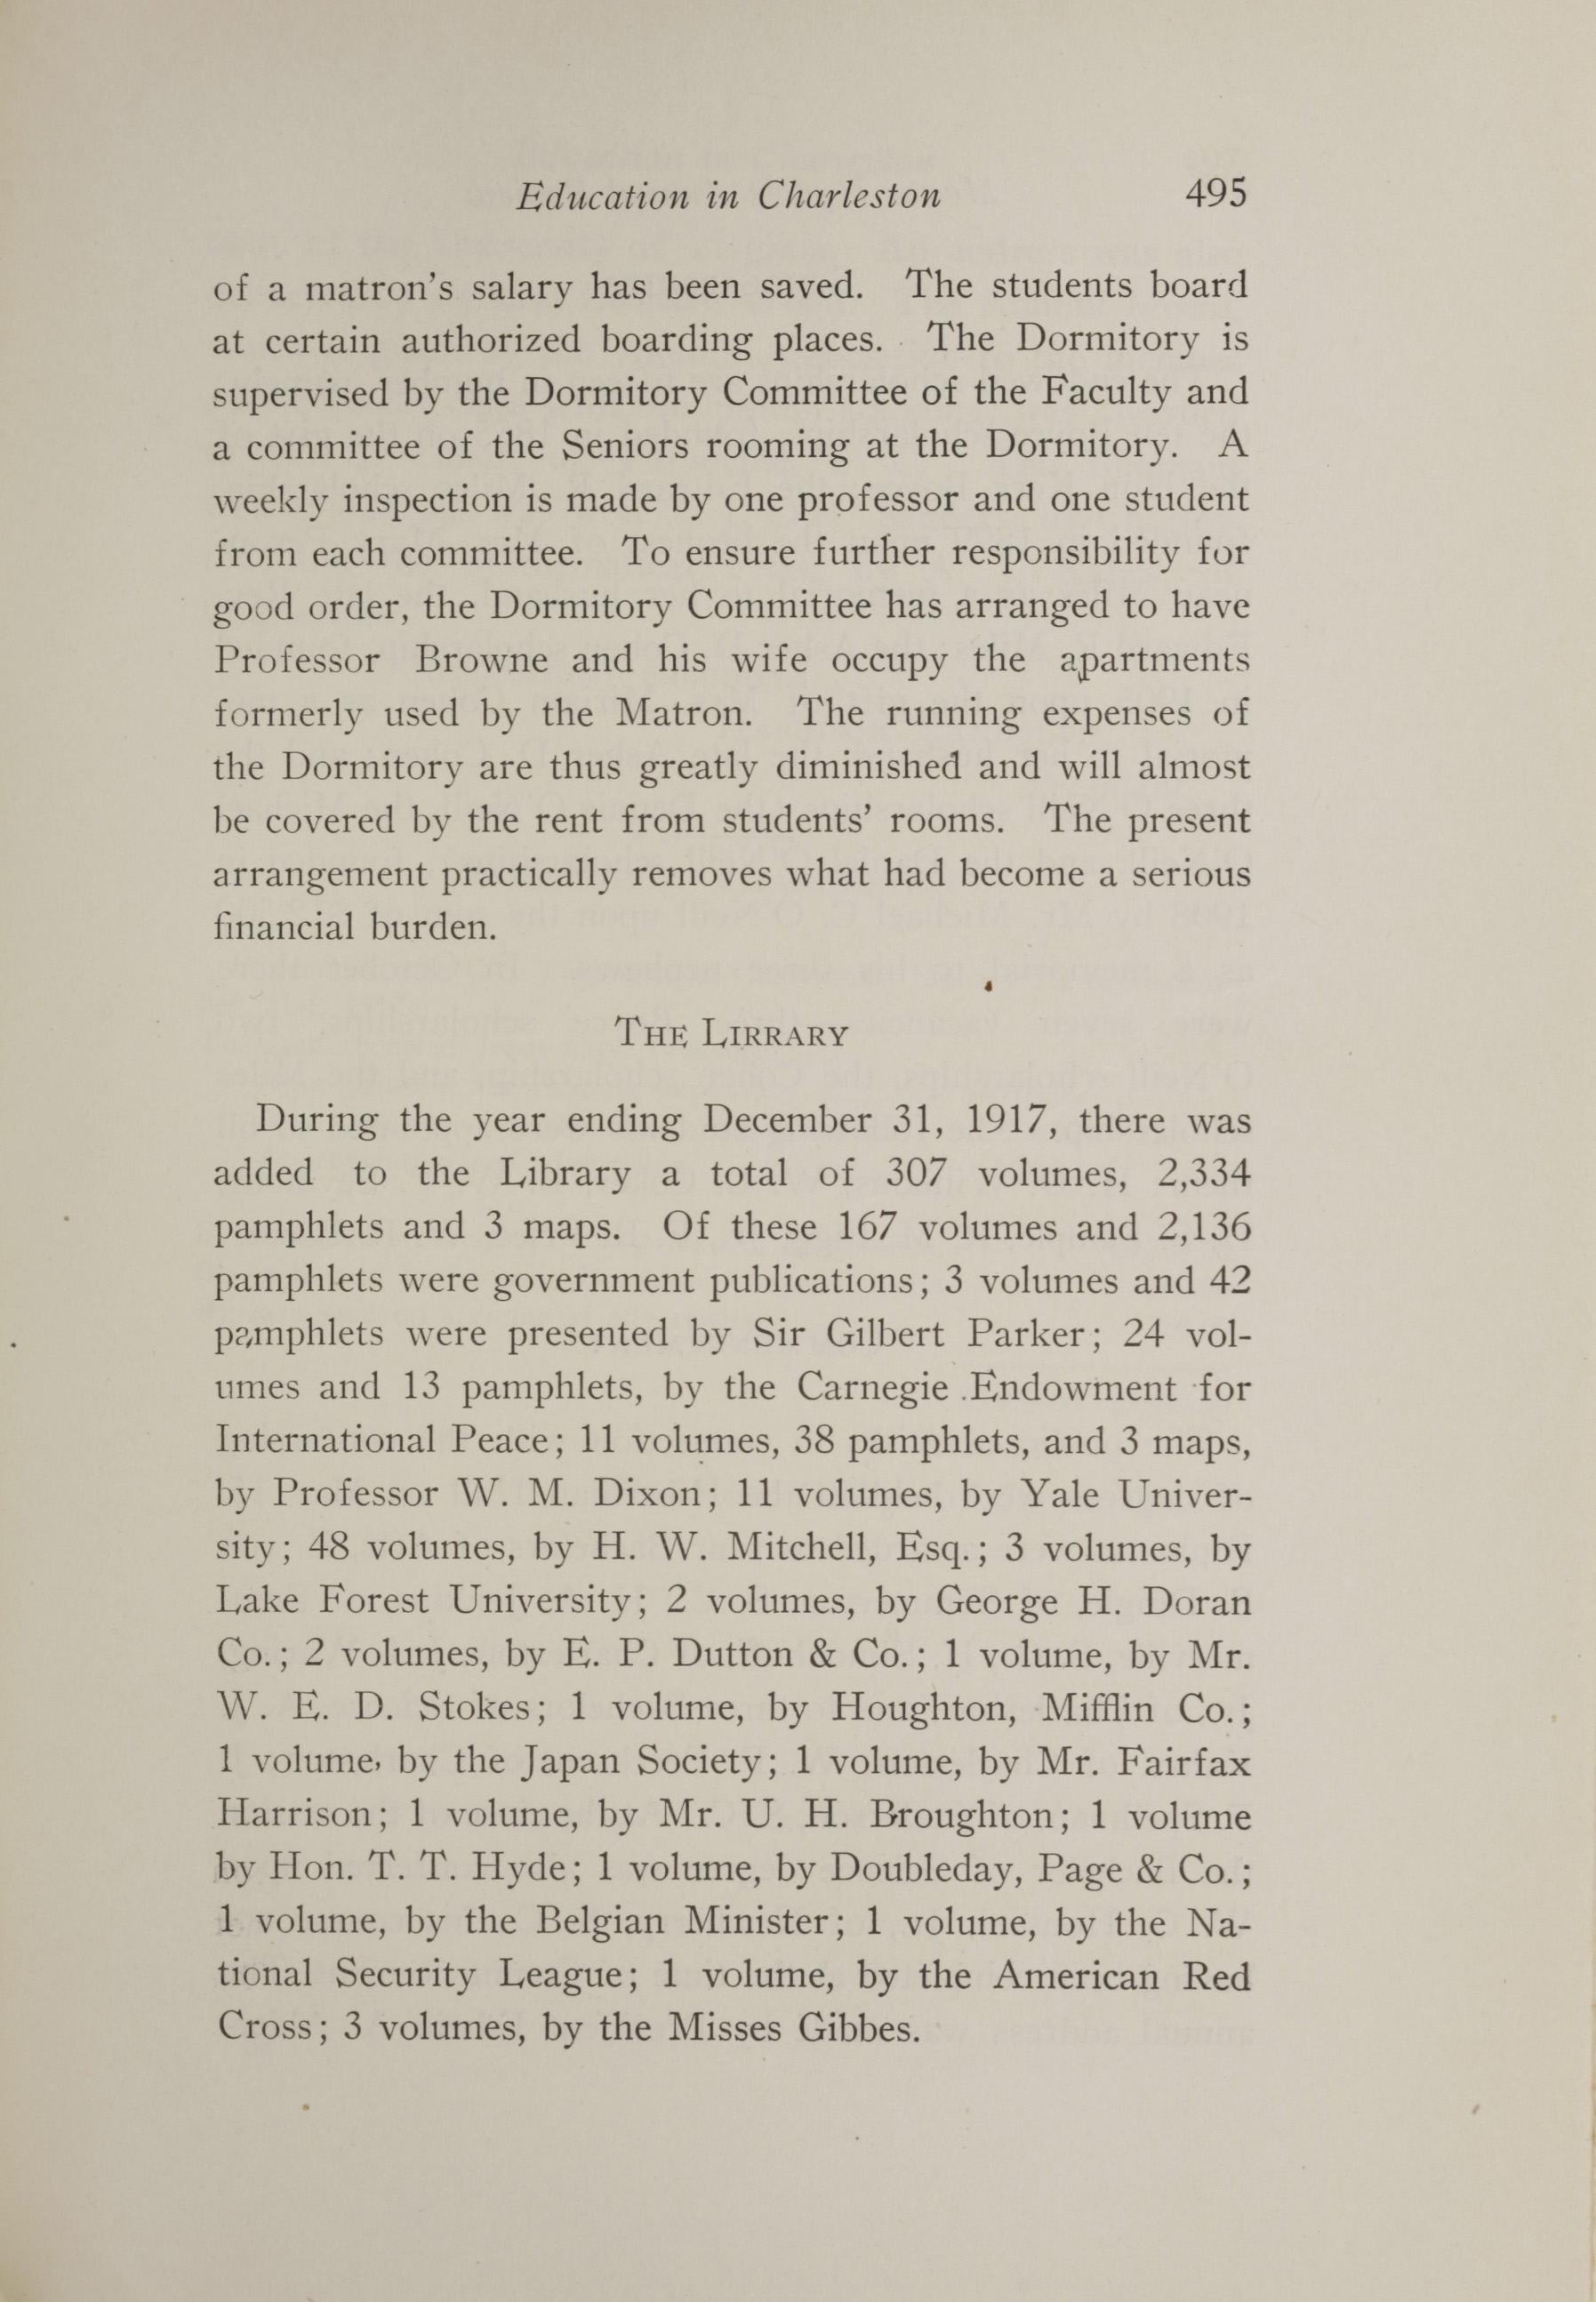 Charleston Yearbook, 1917, page 495